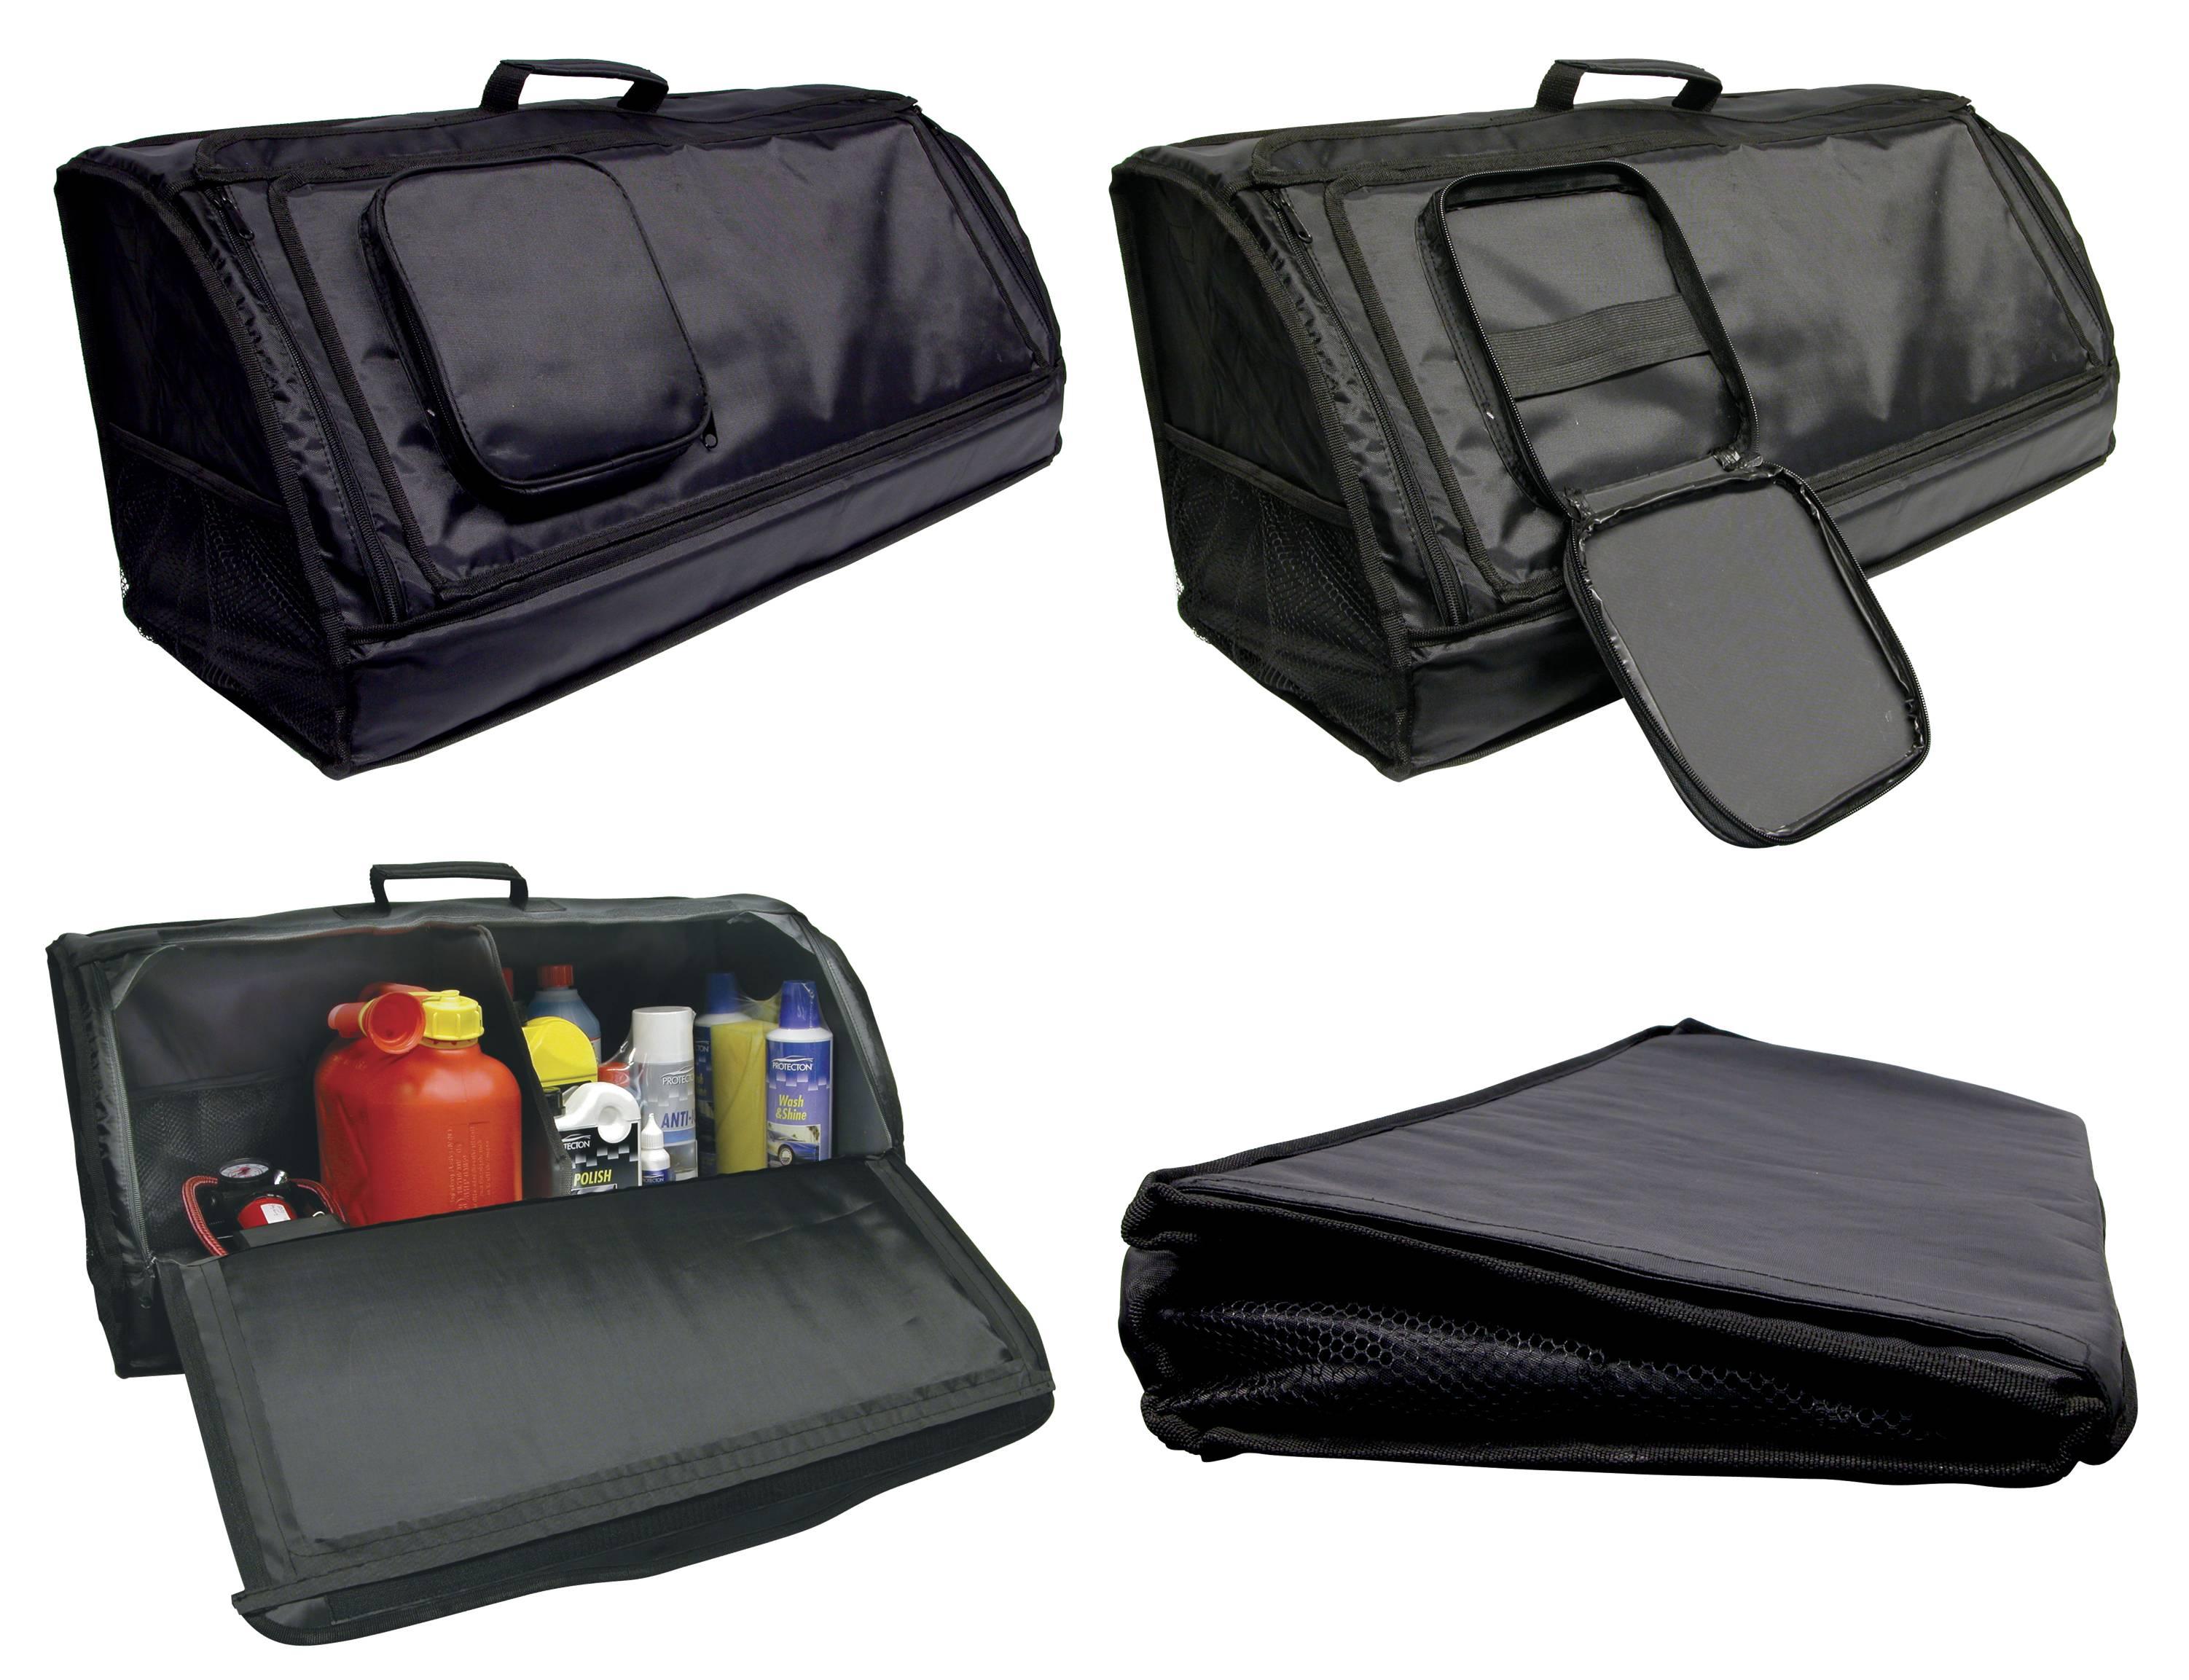 Maletero Compartimentos Bolsa Objetos Porta Con ymwOvPNn80